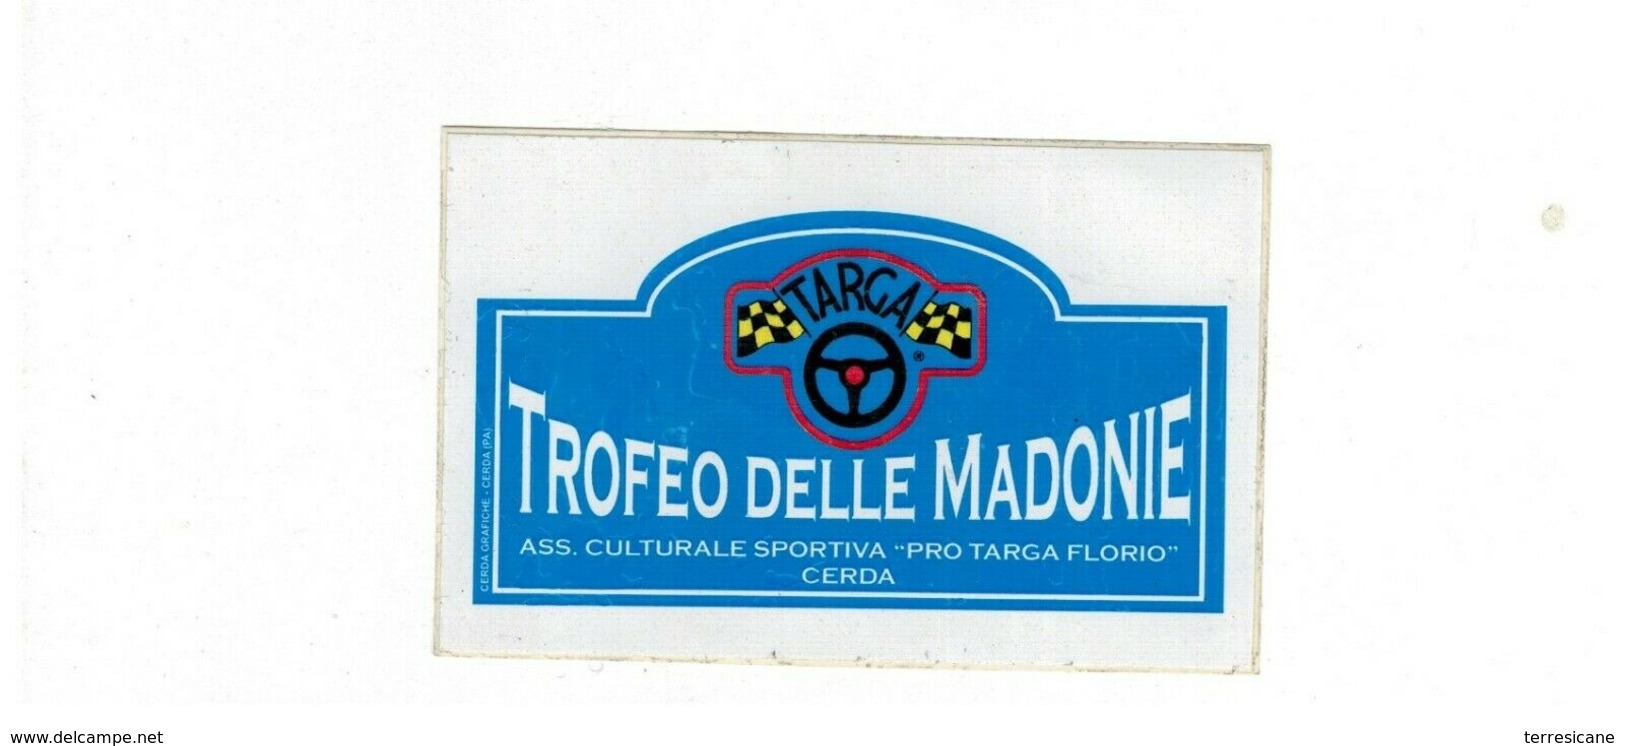 ADESIVO STICKER TROFEO DELLE MADONIE ASS. SPORTIVA PRO TARGA FLORIO RRR - Adesivi